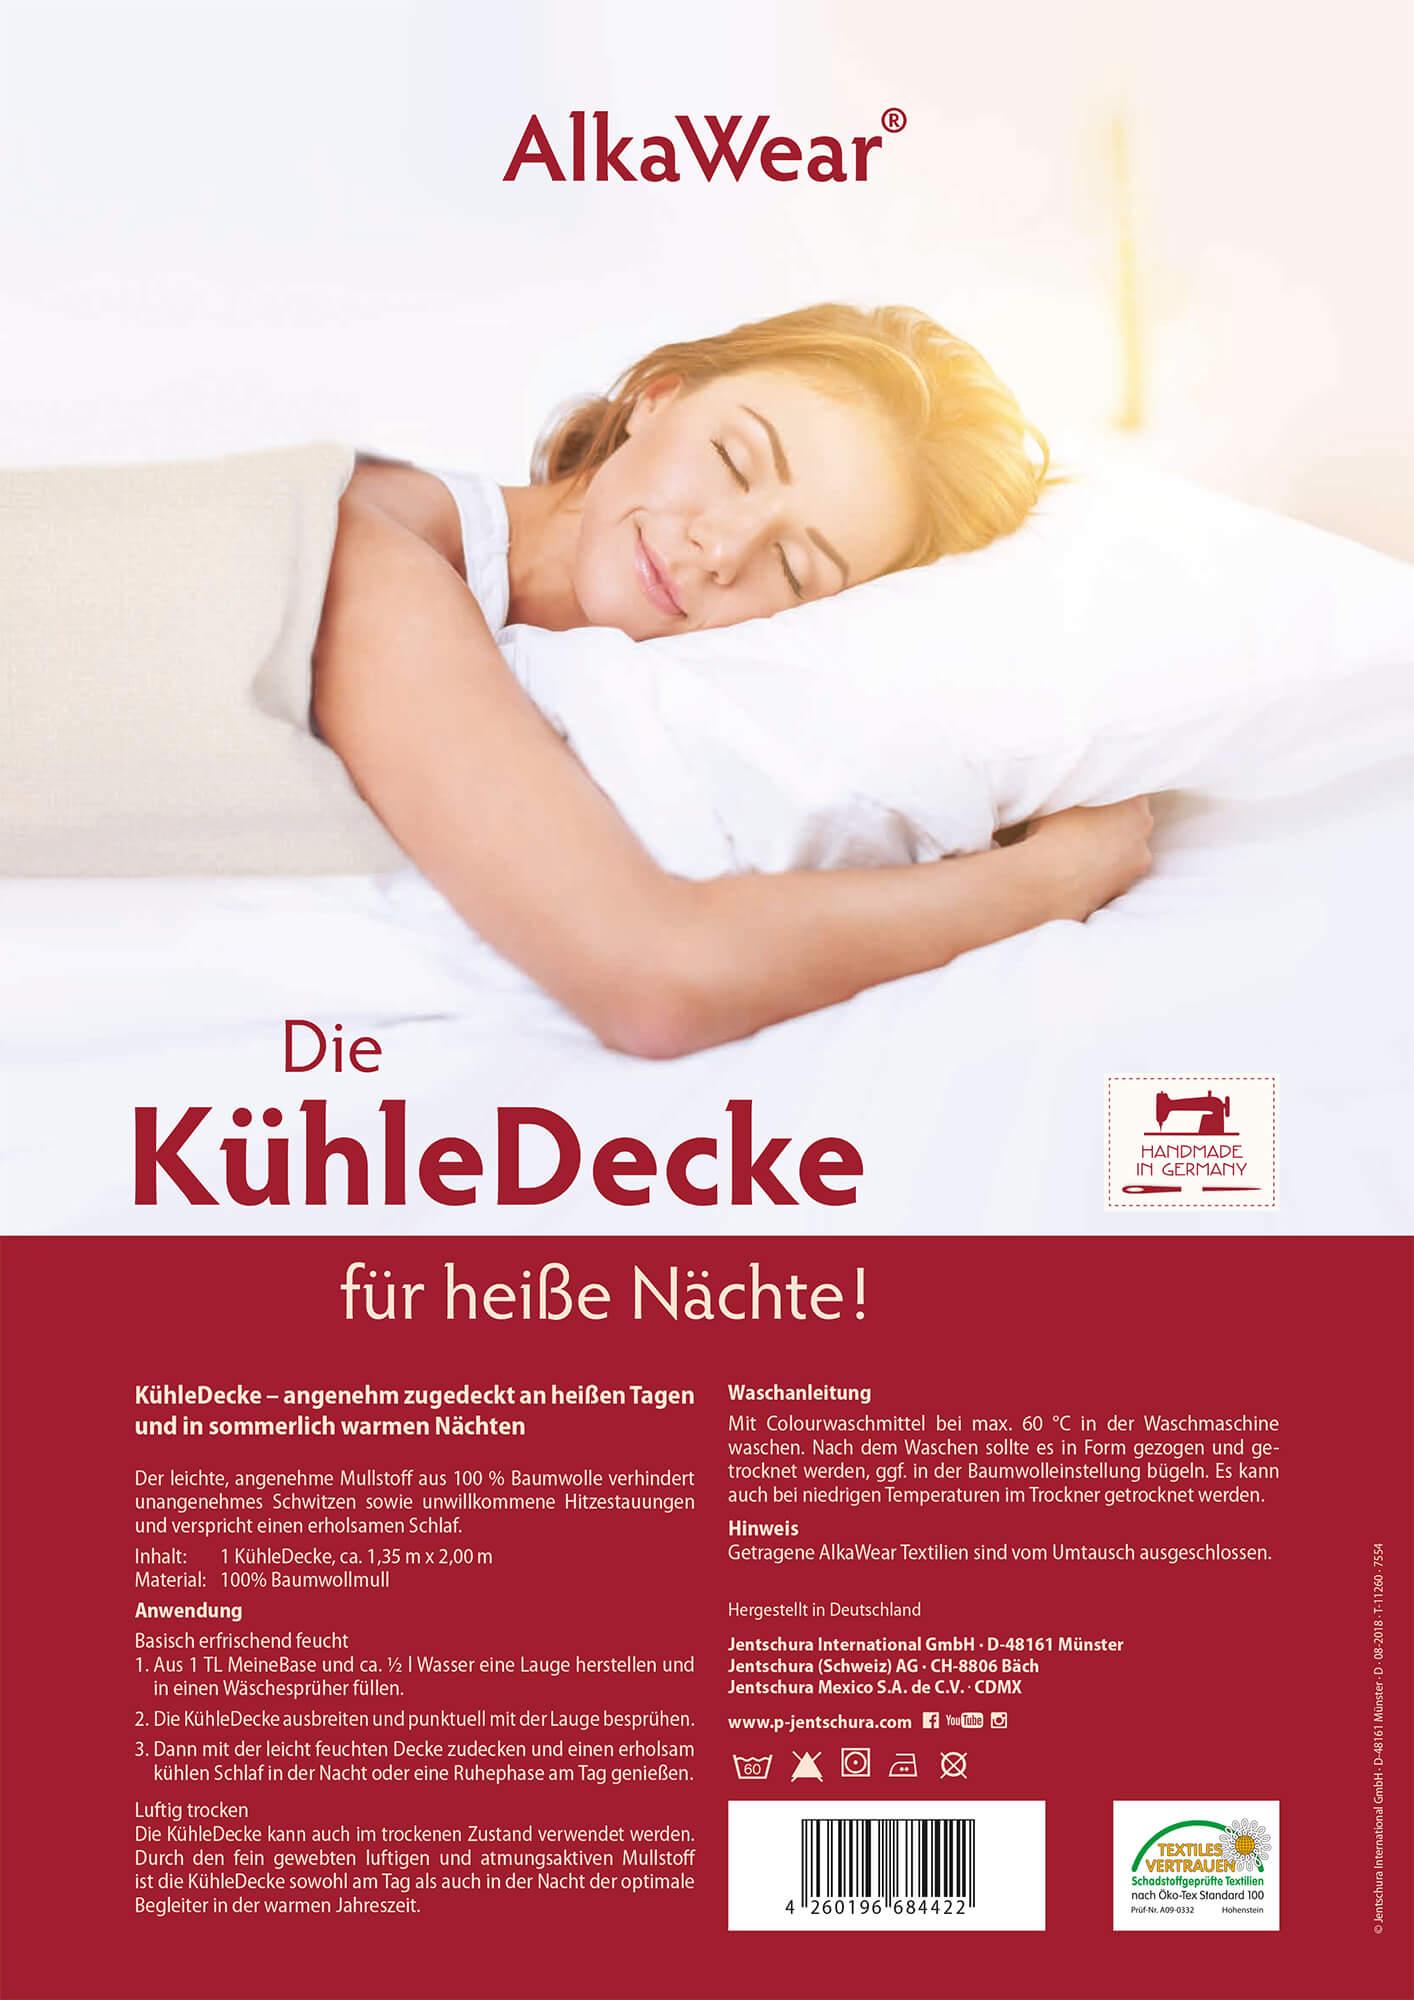 KühleDecke